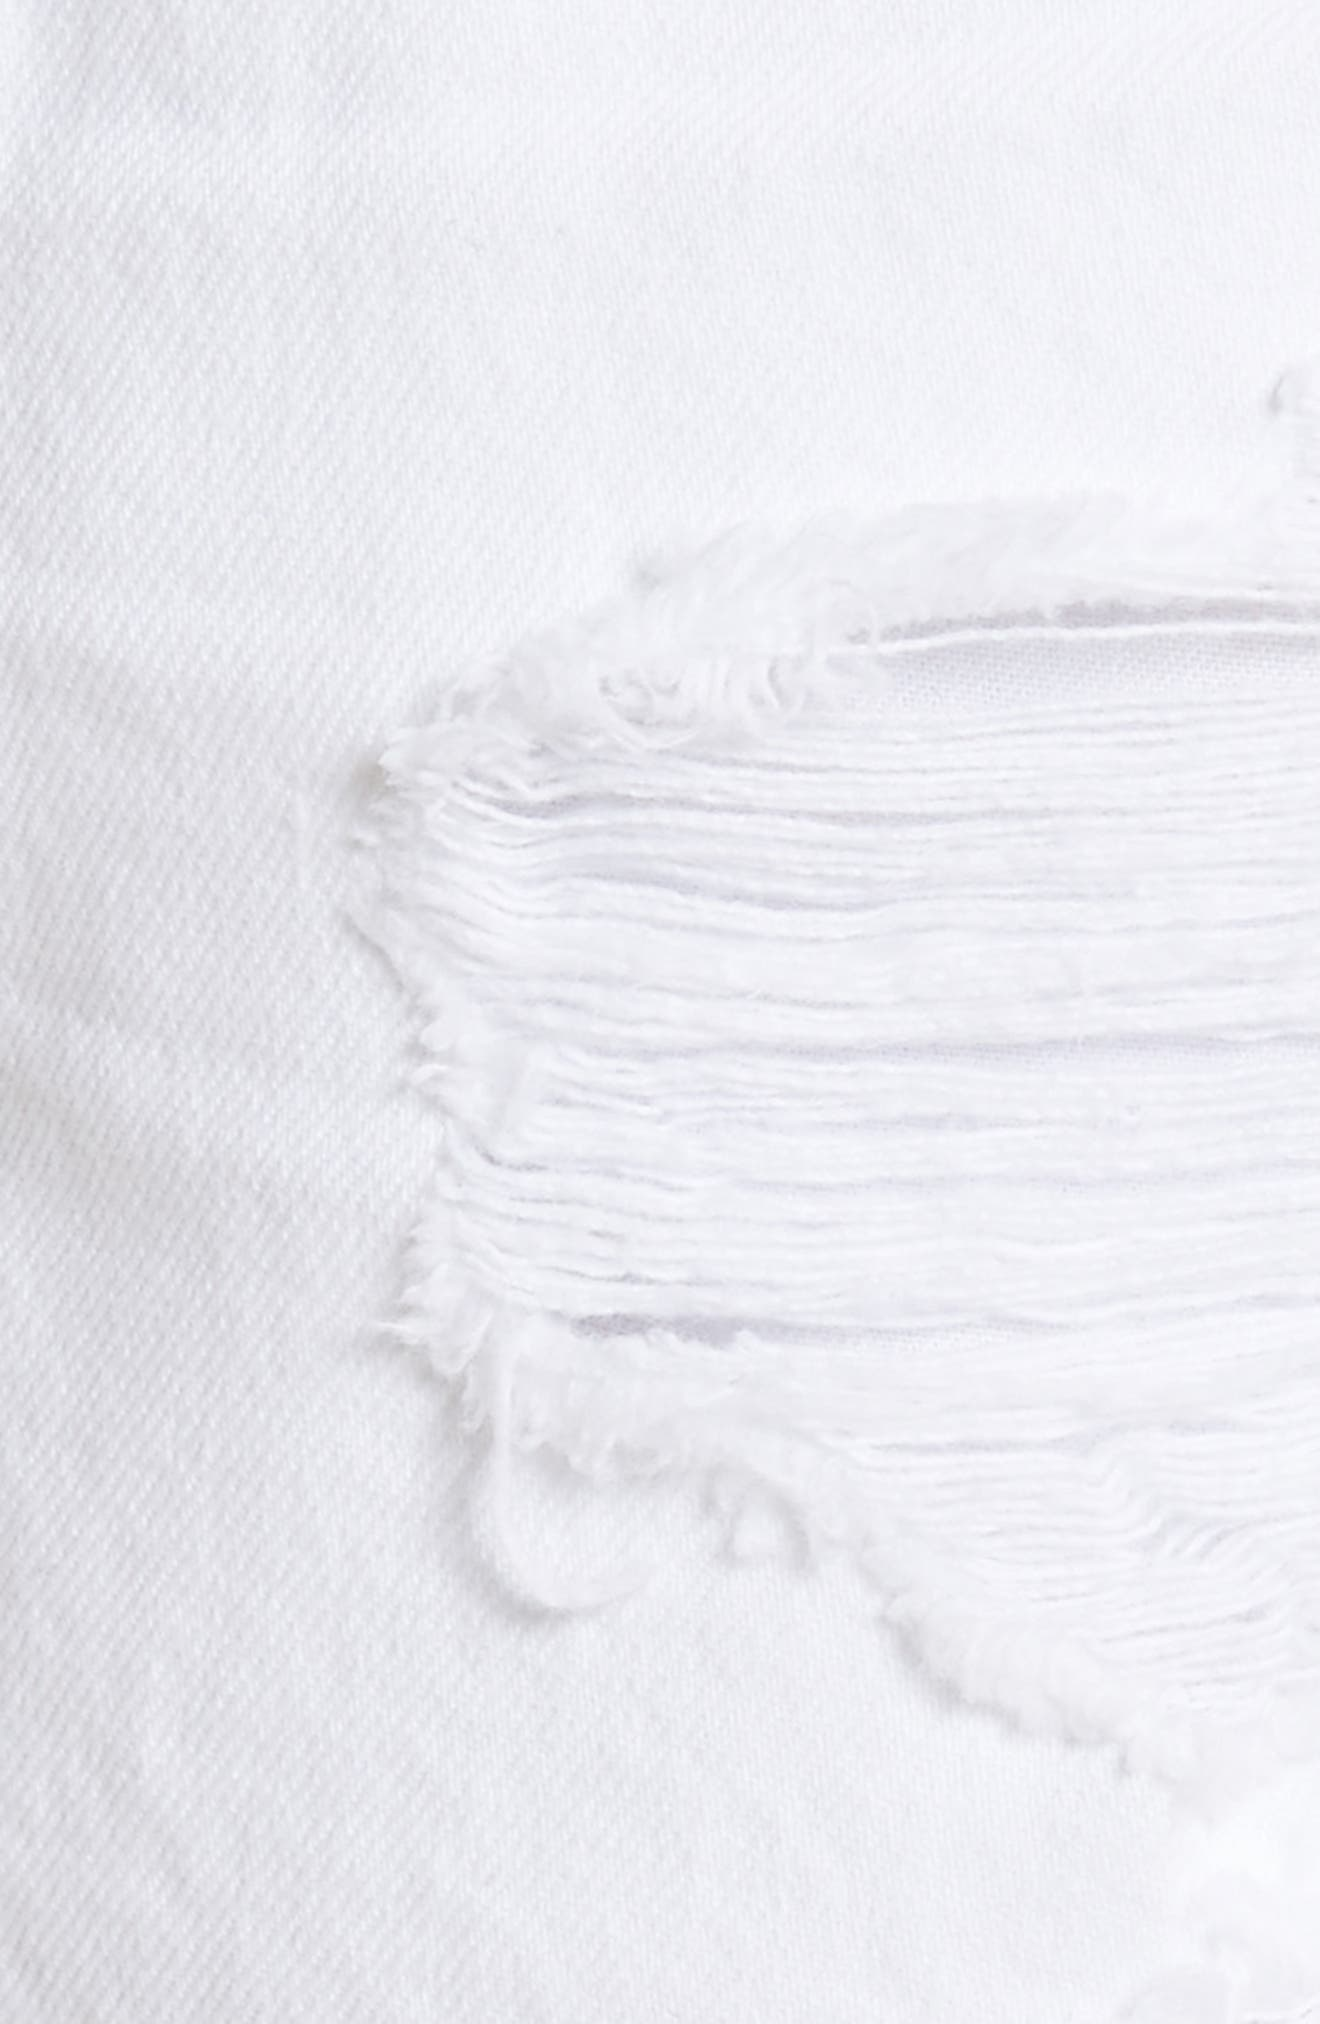 Bite White Ripped Denim Shorts,                             Alternate thumbnail 5, color,                             Bleached Destroy